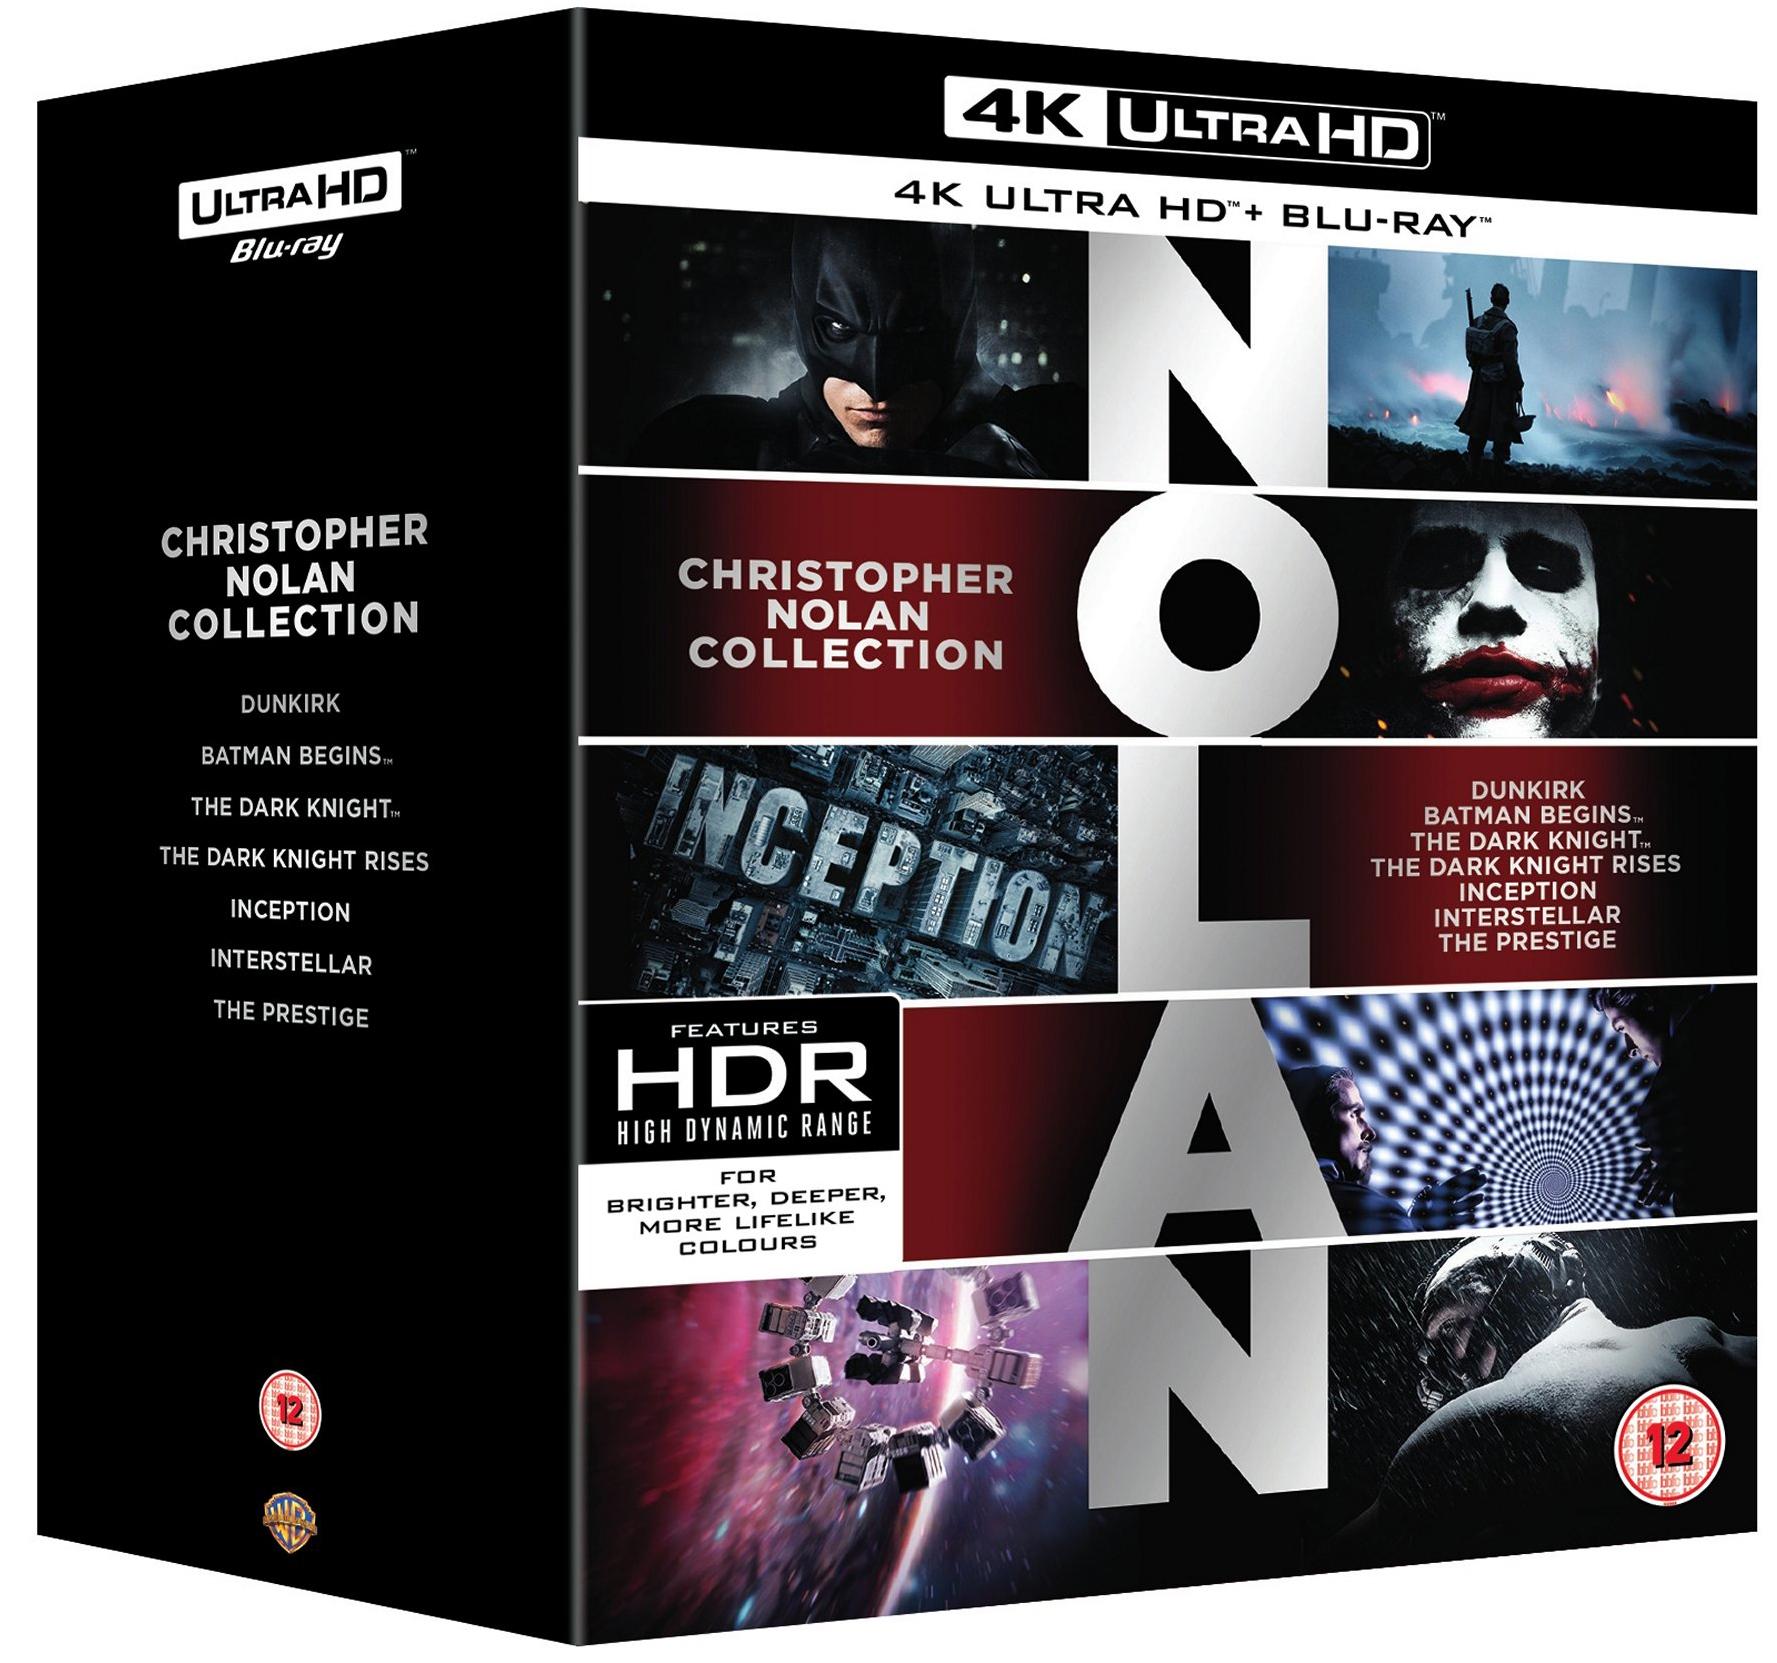 Christopher Nolan Collection 4K UHD (Dunkirk/Batman/Inception/Interstellar/etc) £59.99 @ HMV